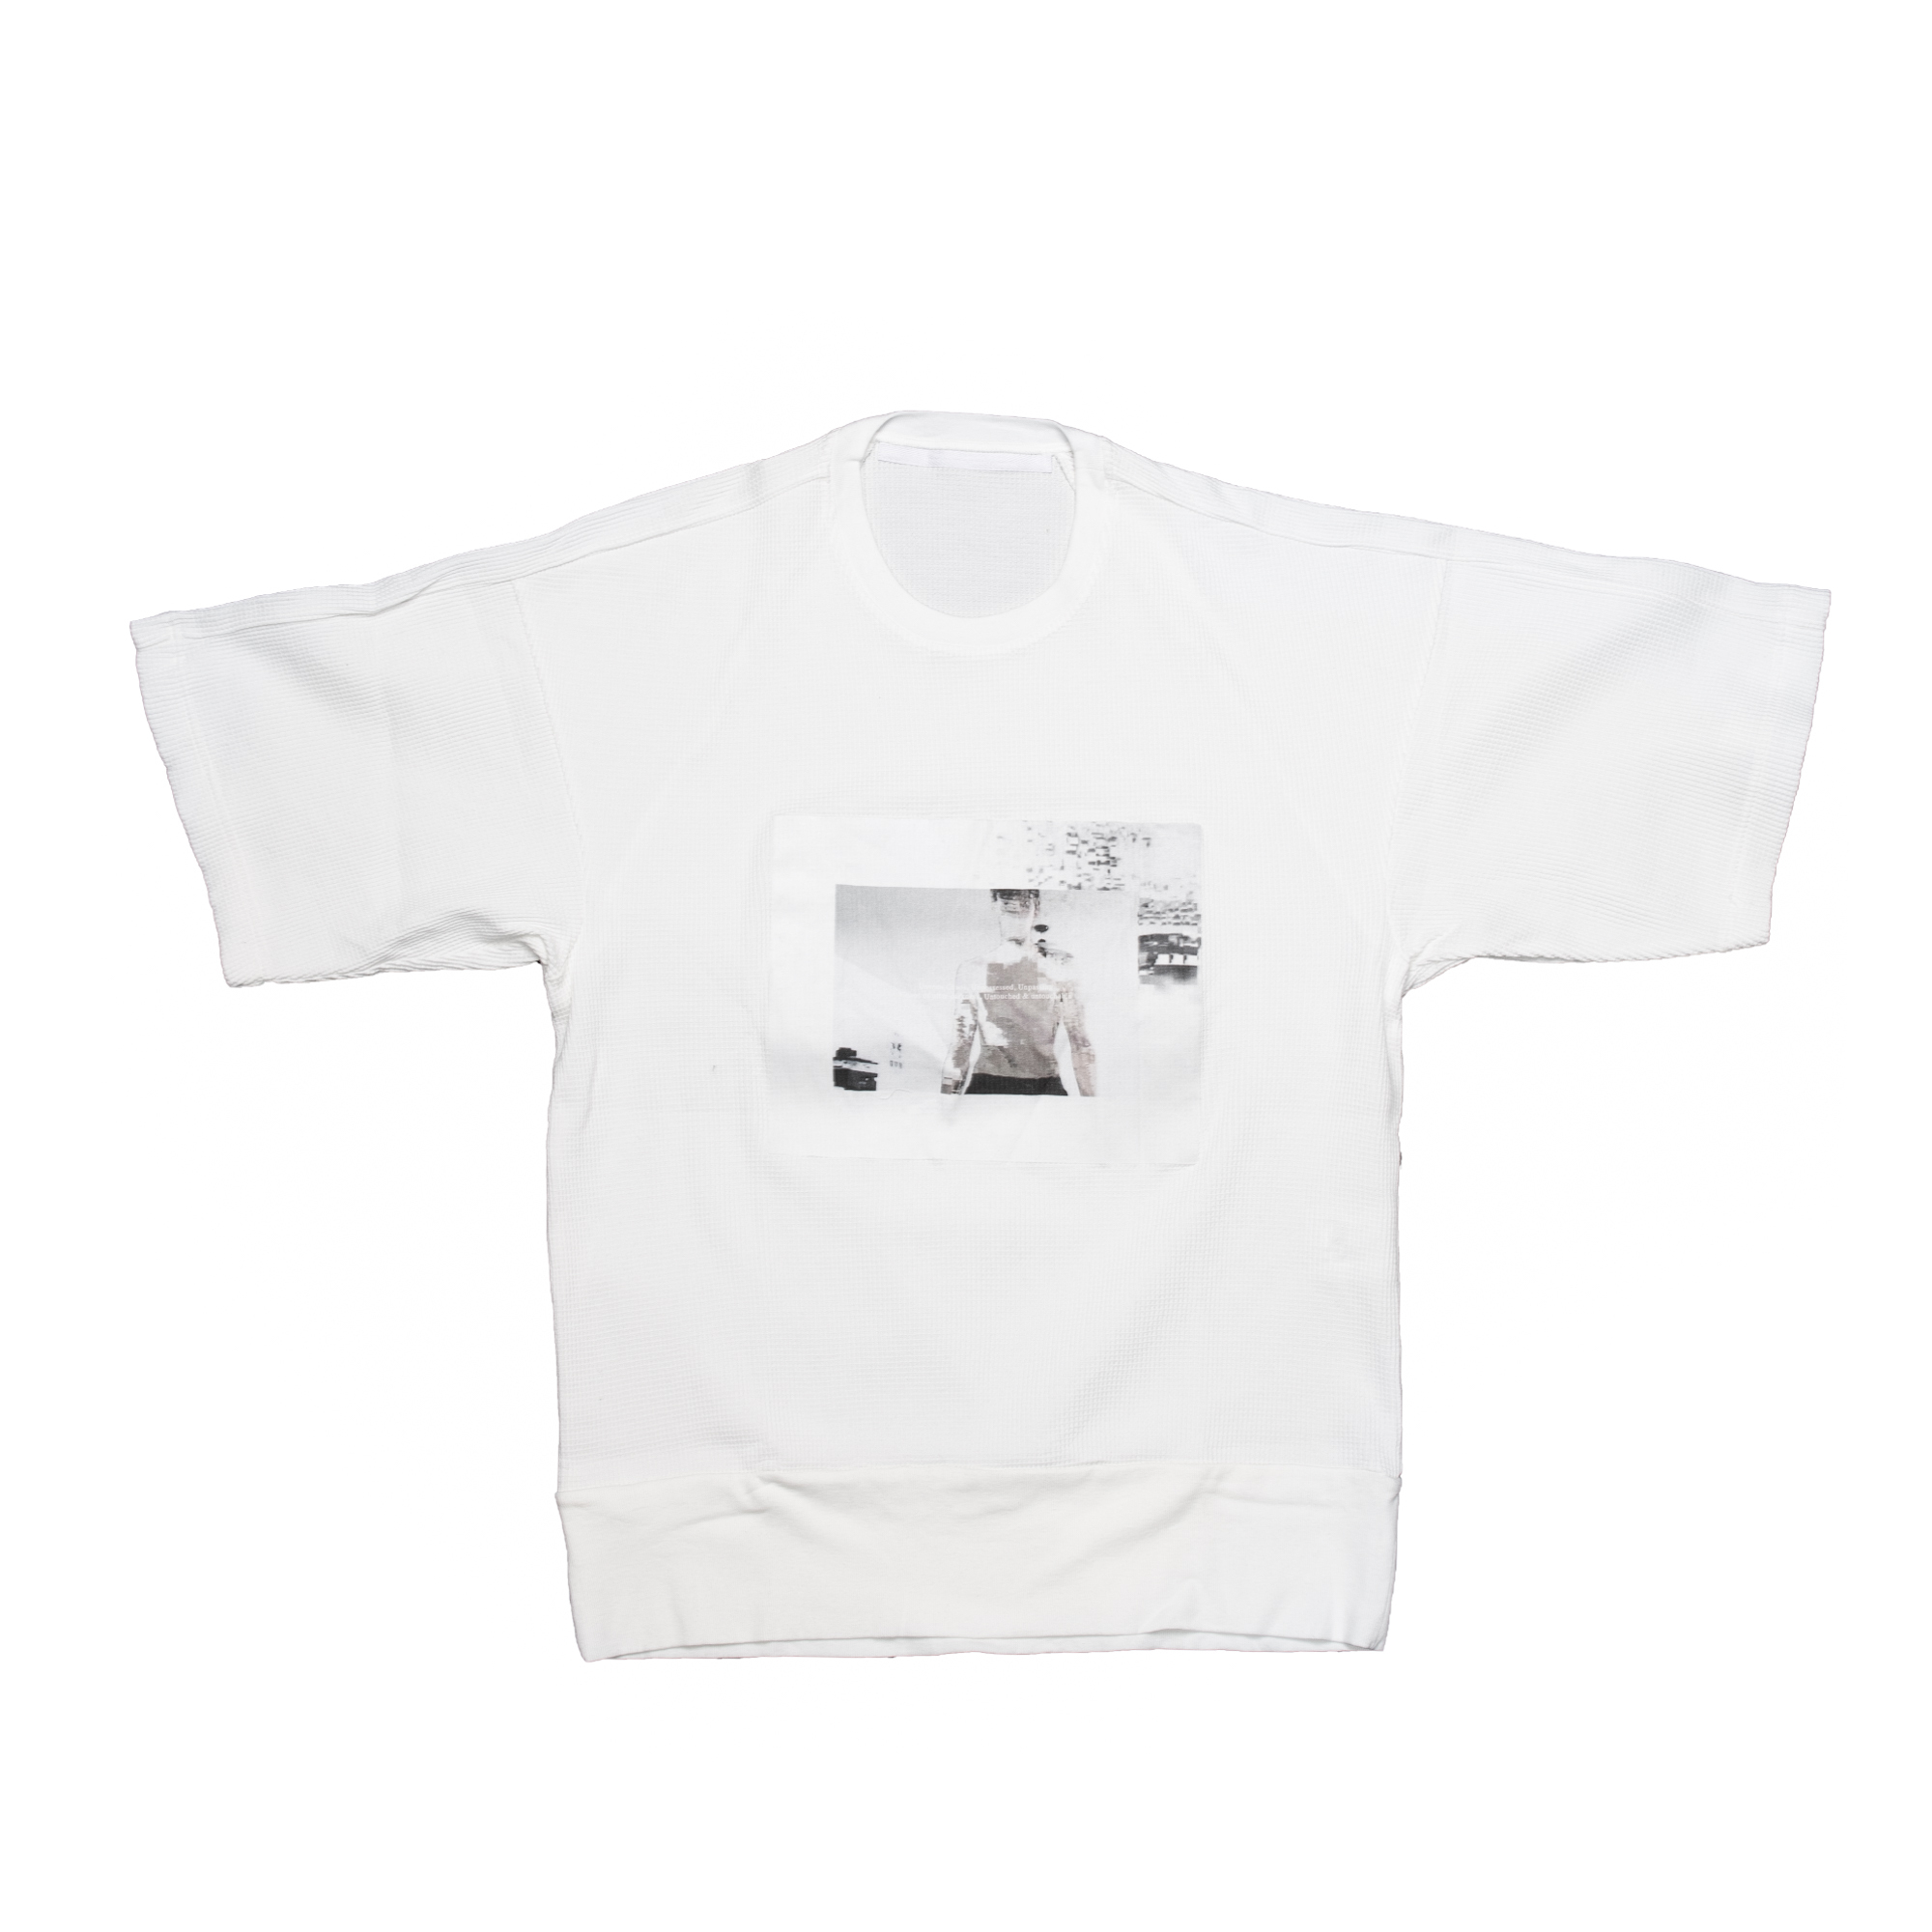 657CPM20-OFF / プリント BIG Tシャツ